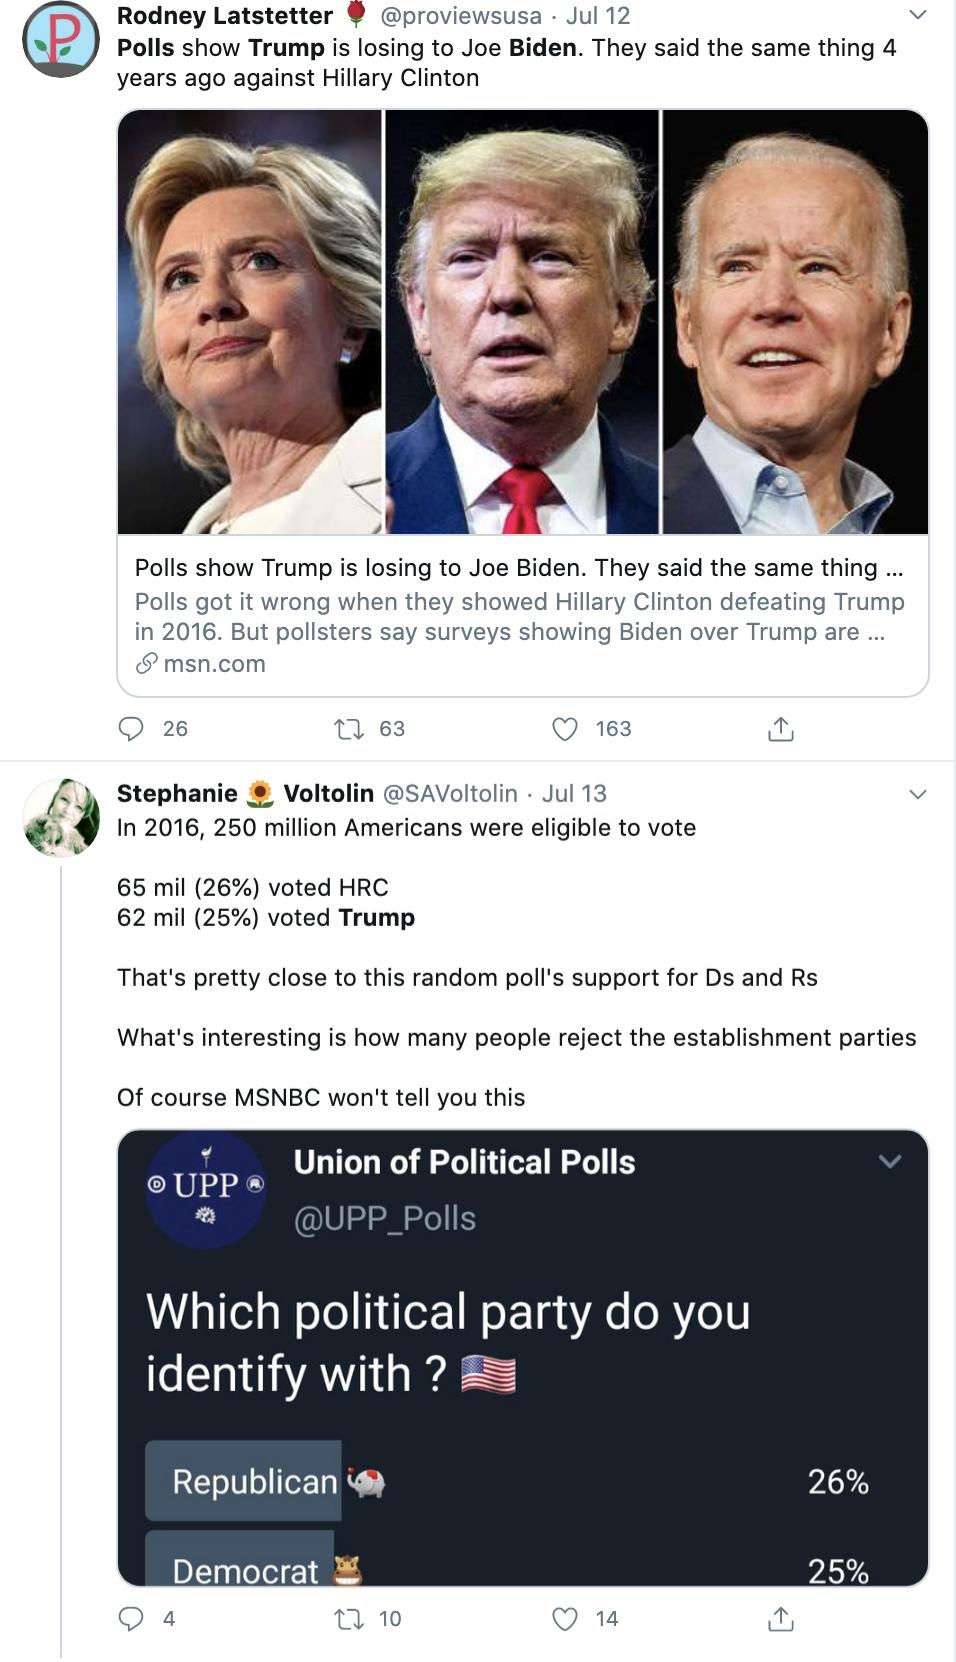 Screen-Shot-2020-07-16-at-10.47.27-AM Biden Rockets Past Trump By 15 Points In Latest National Poll Coronavirus Featured Politics Polls Top Stories